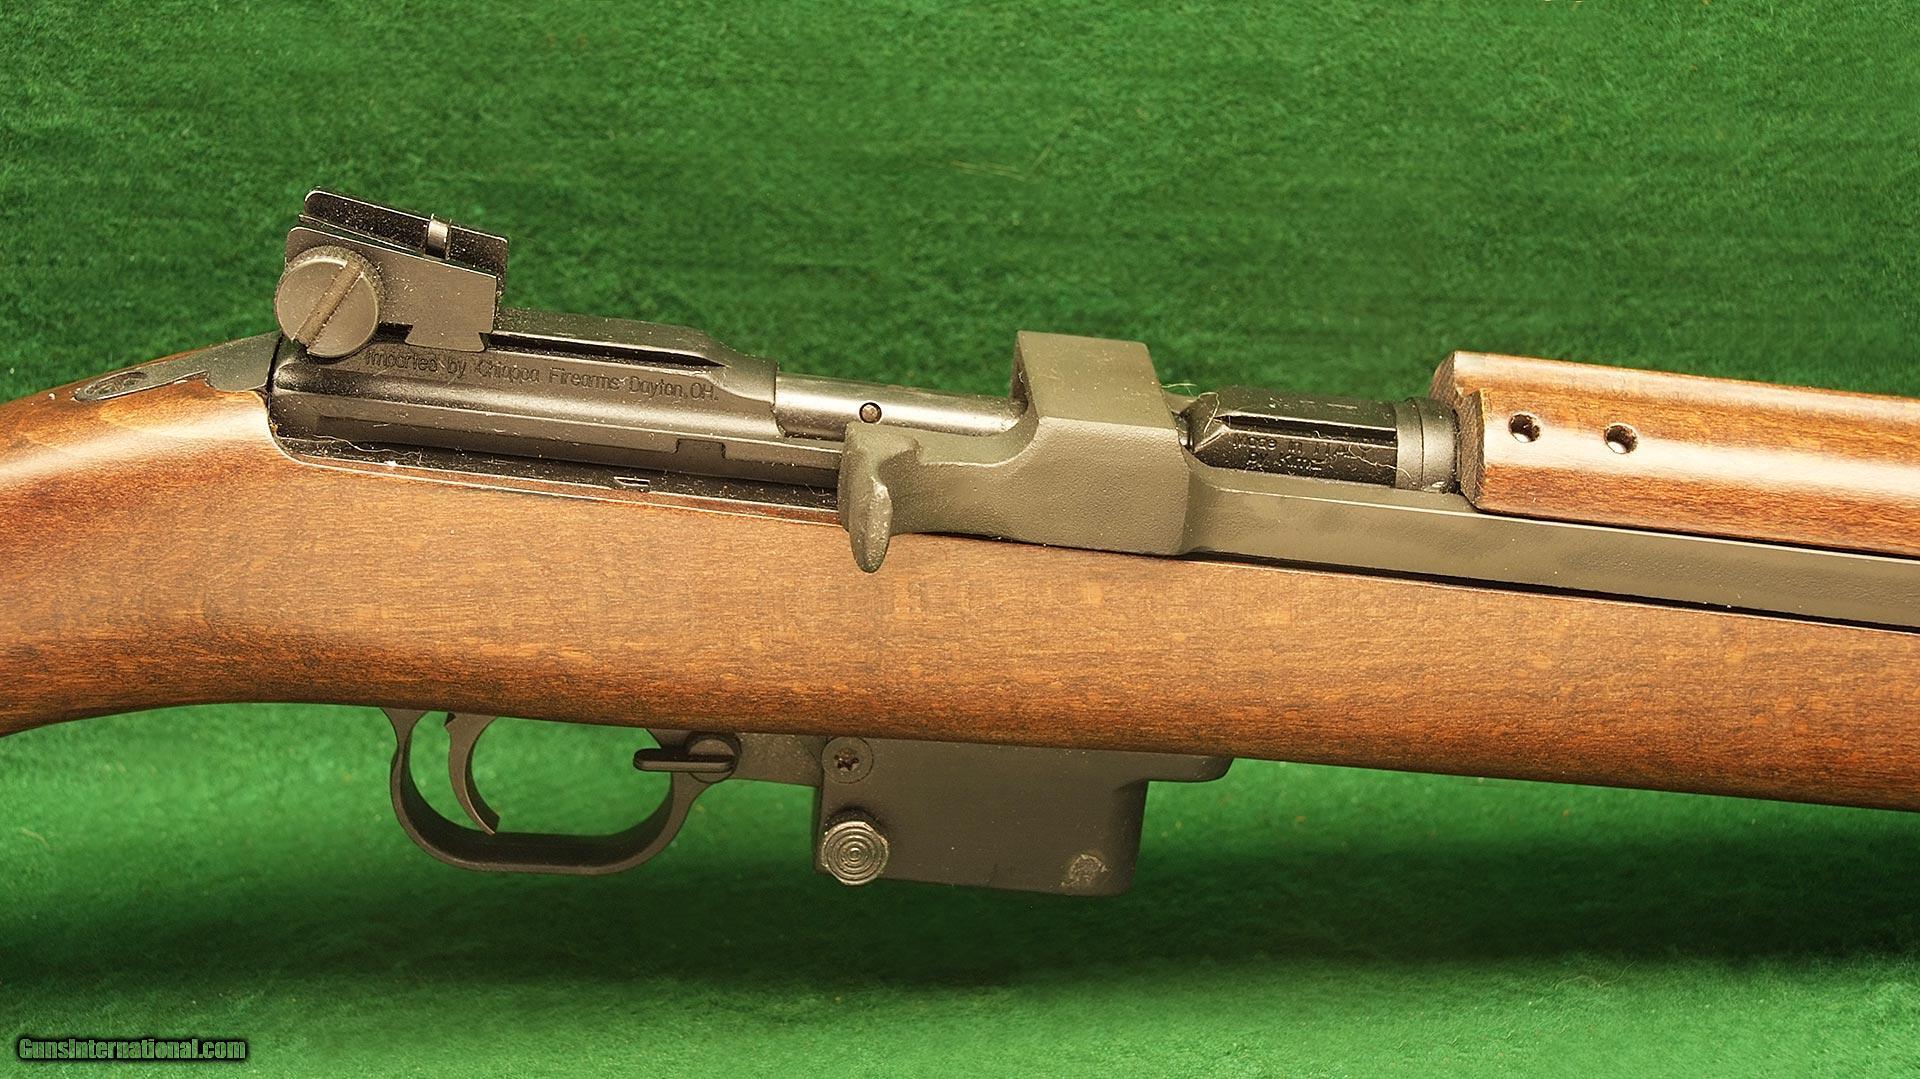 Chiappa M1-9 Carbine Caliber 9mm Rifle